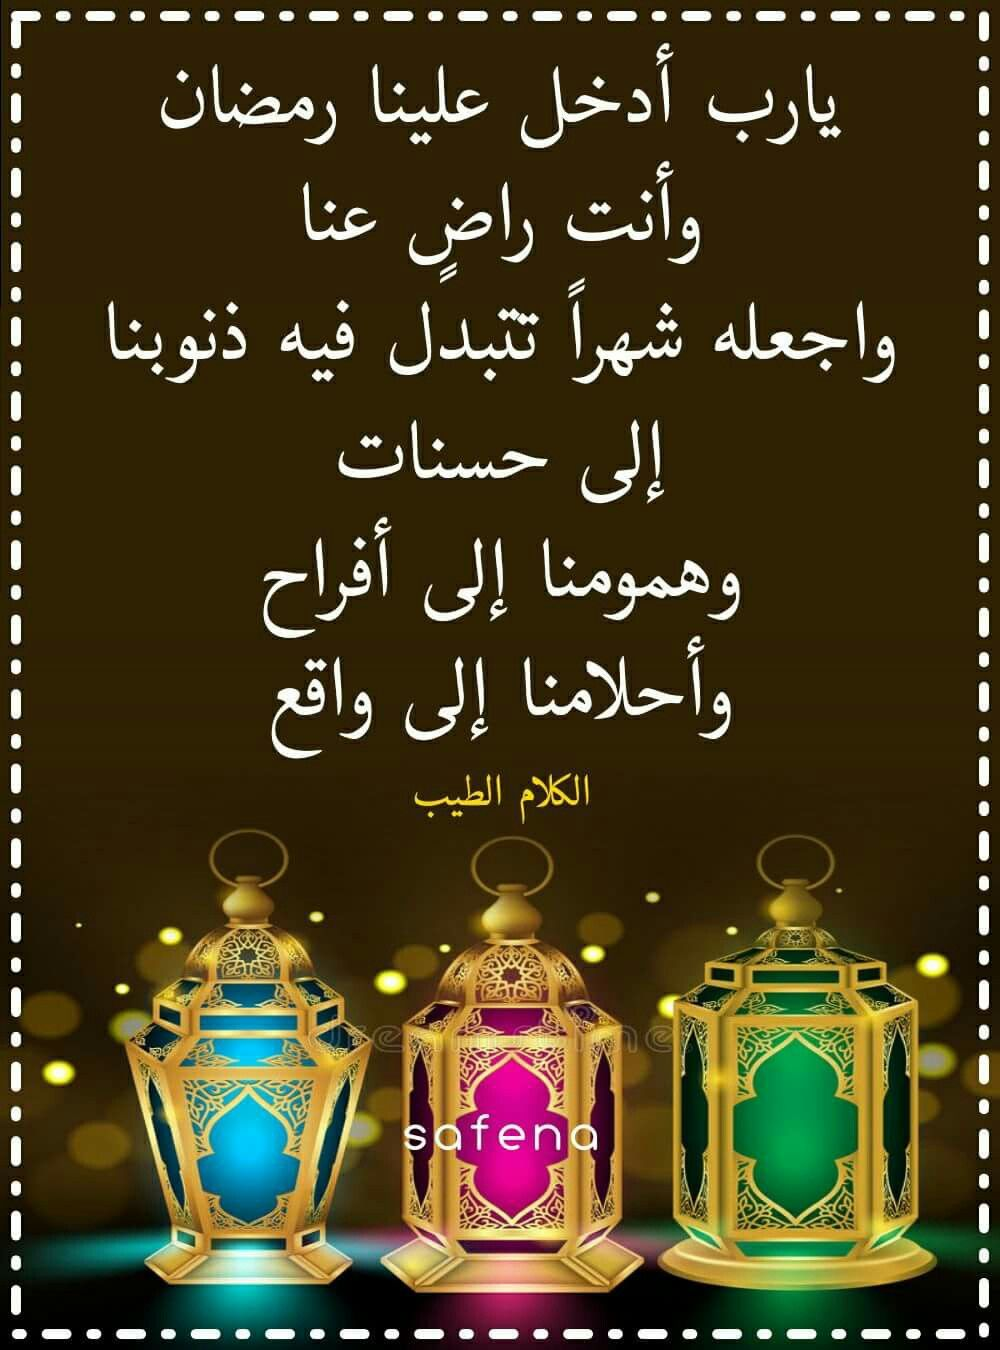 Pin by وسام عساف on يا الله Facebook posts, Movie